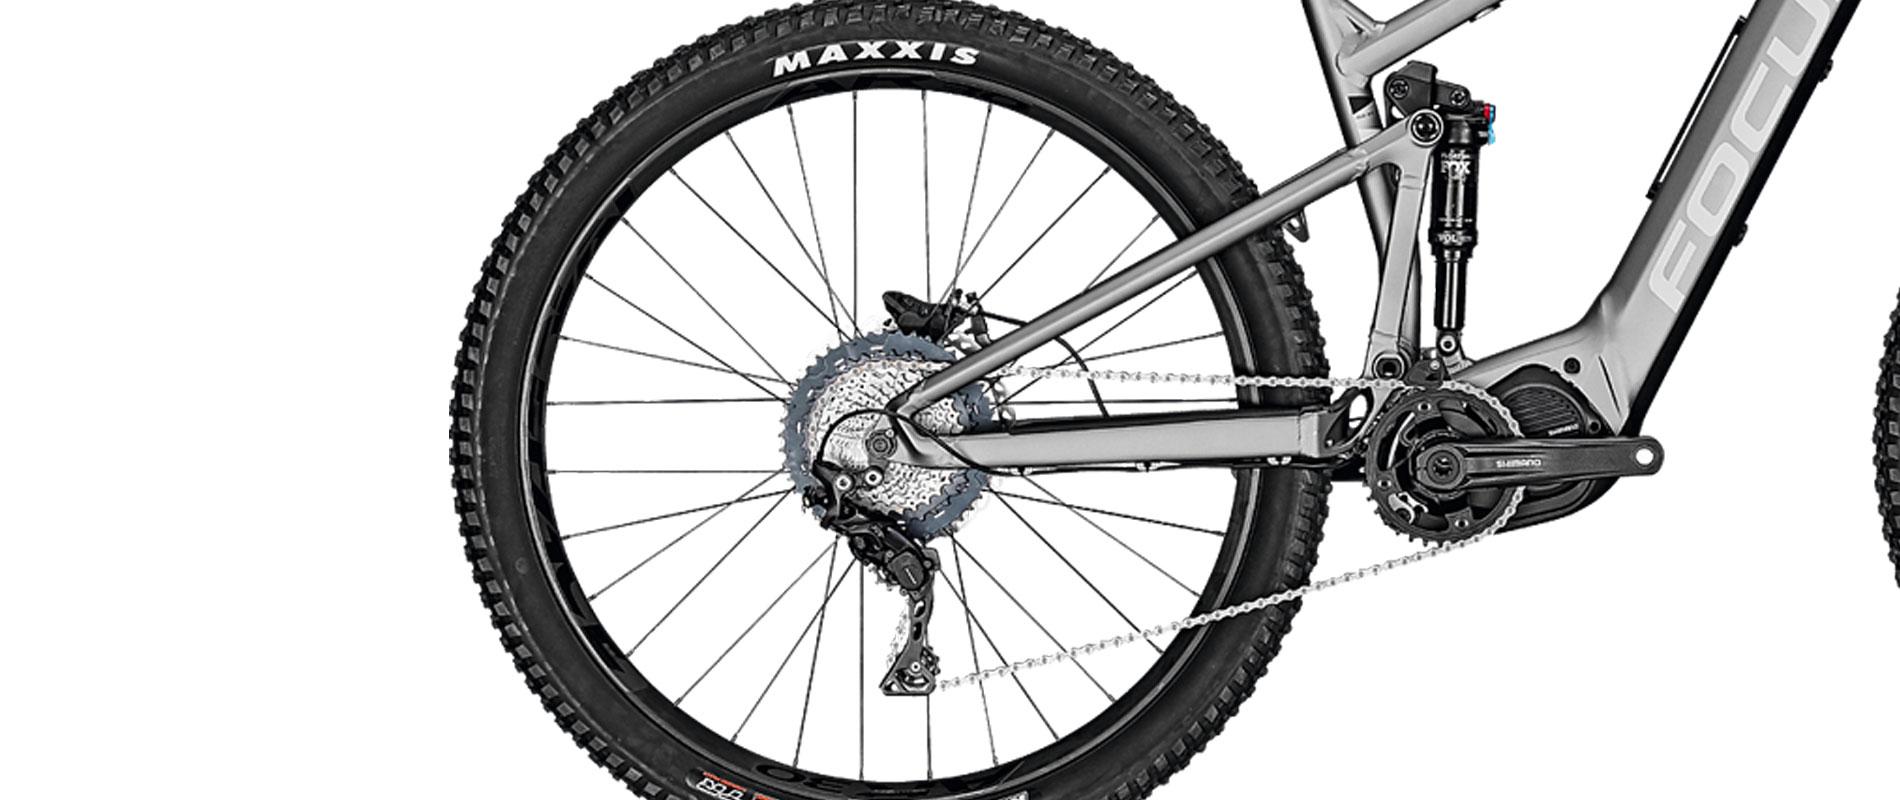 https://bikepointtenerife.com/wp-content/uploads/2019/05/JAM2-5.8-NINE-2.jpg